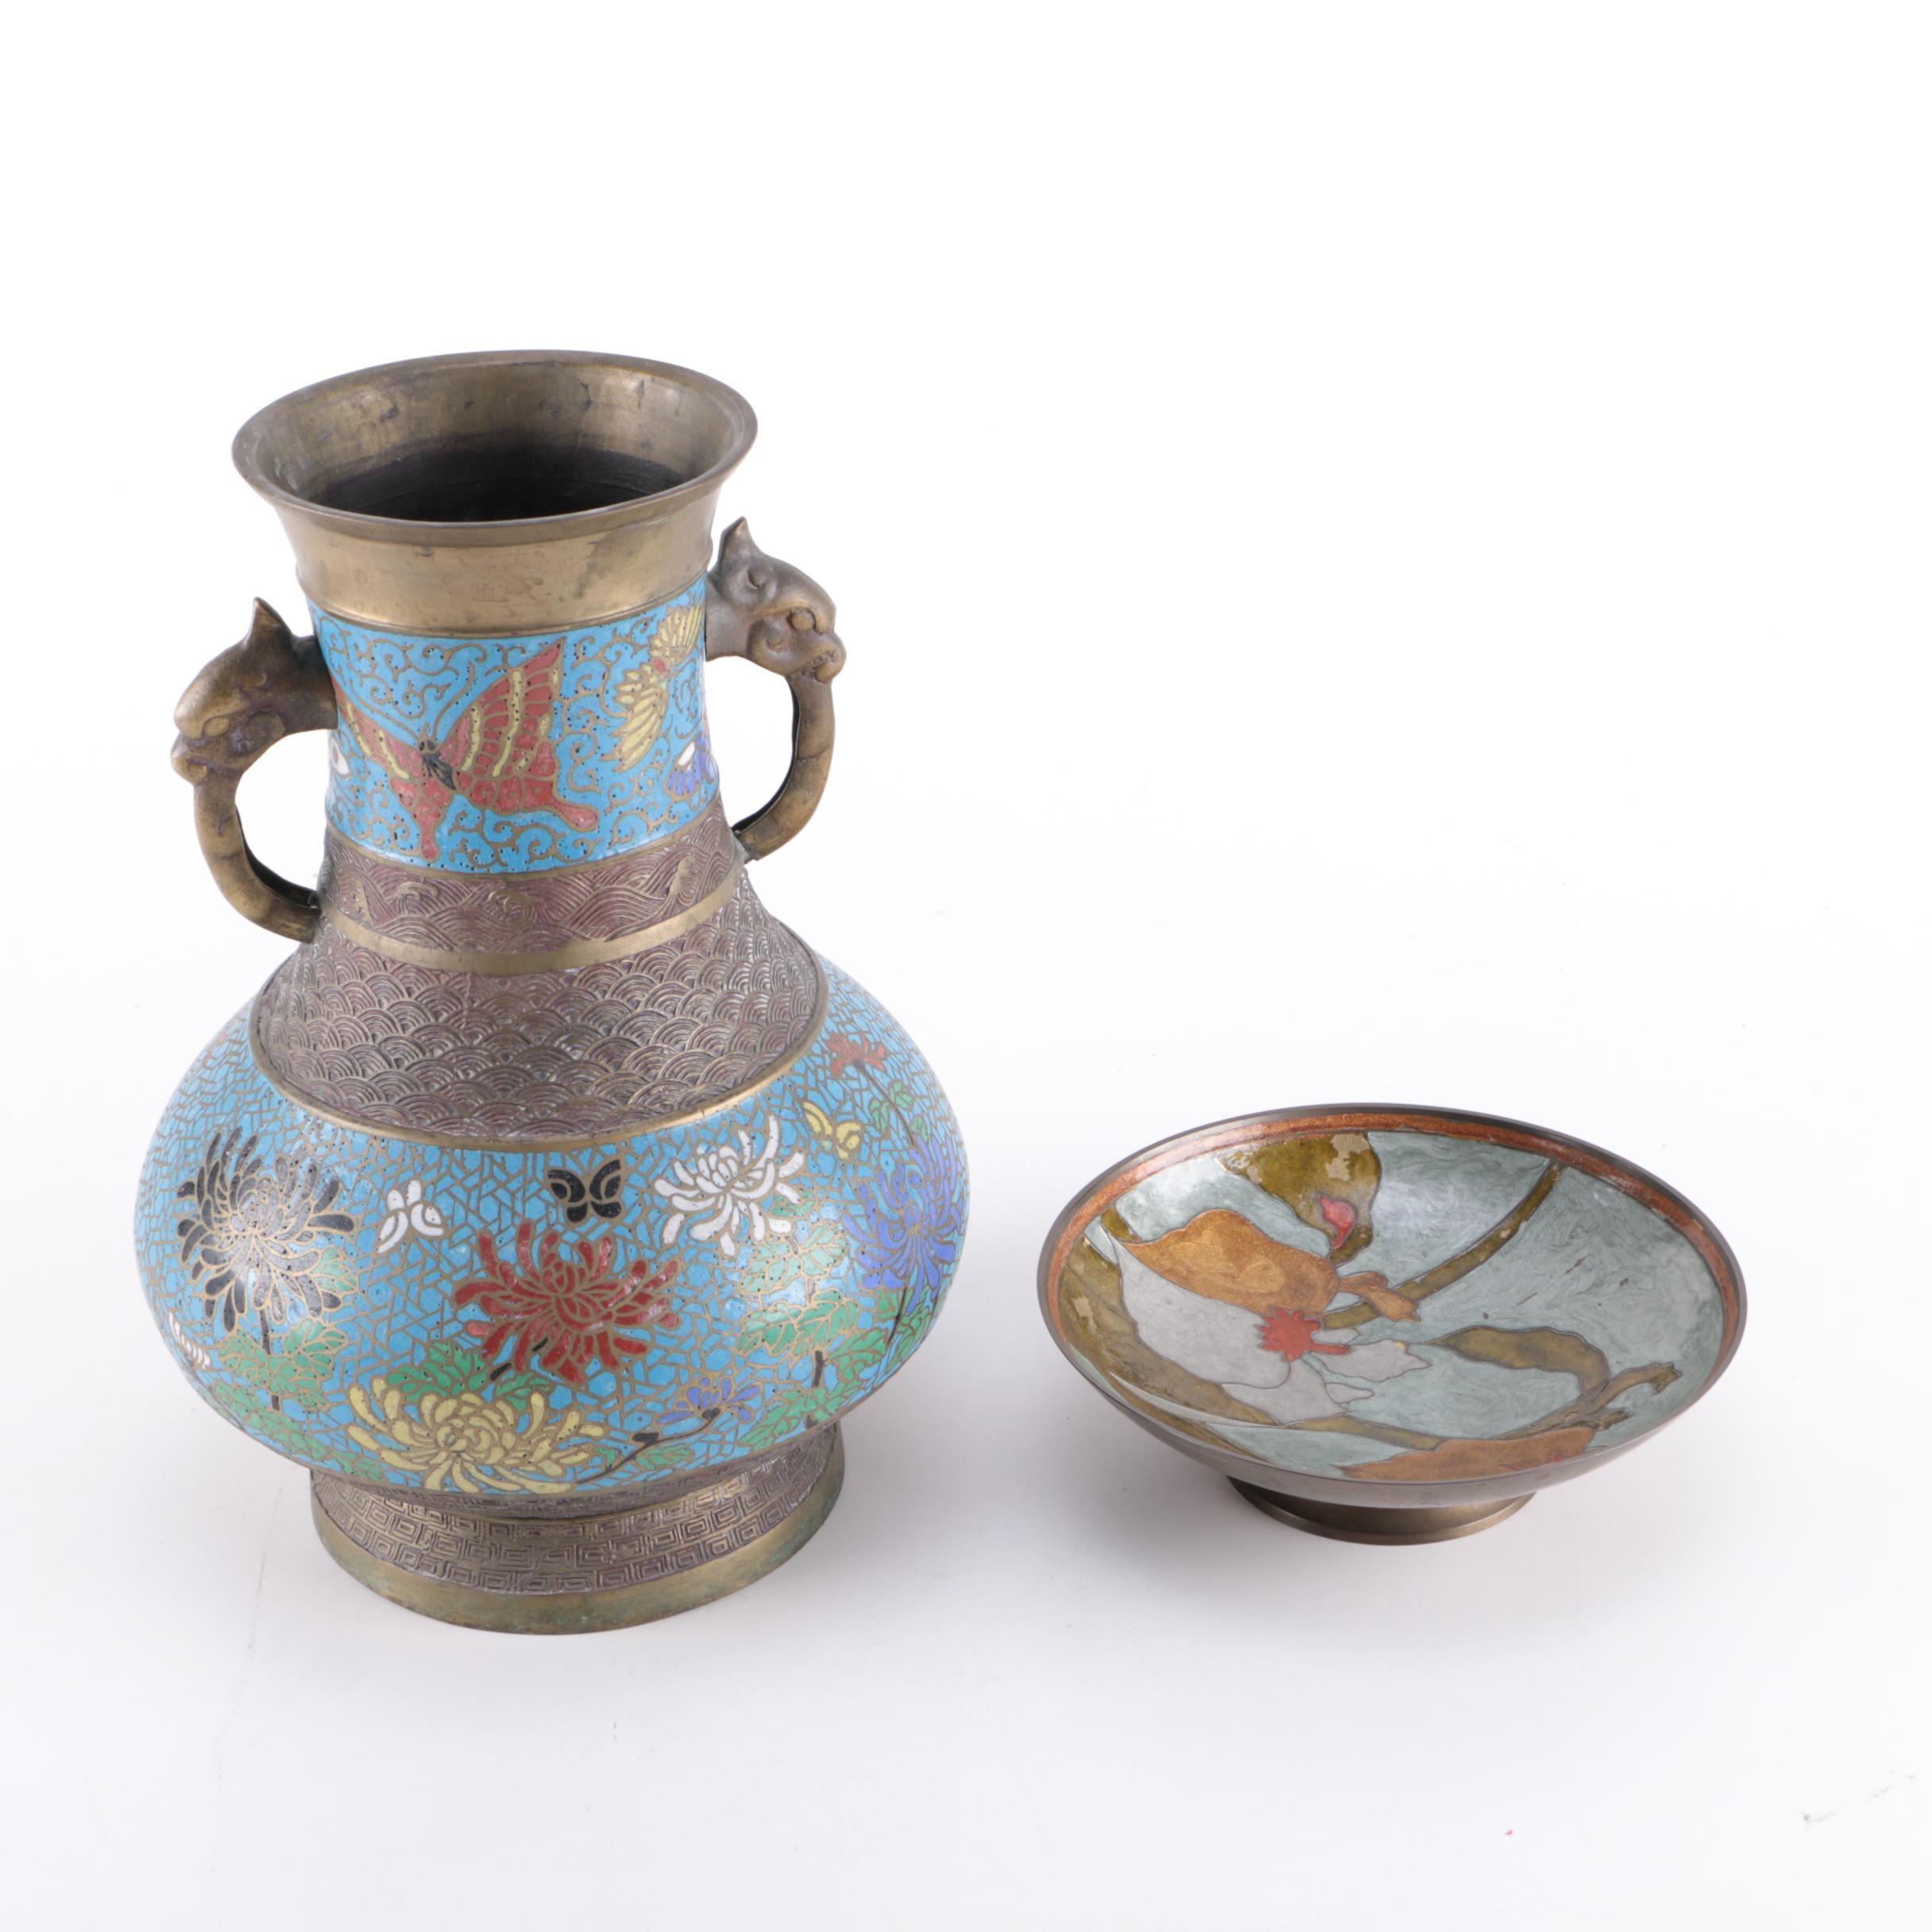 Cloisonné Enamel Vase and Pin Dish